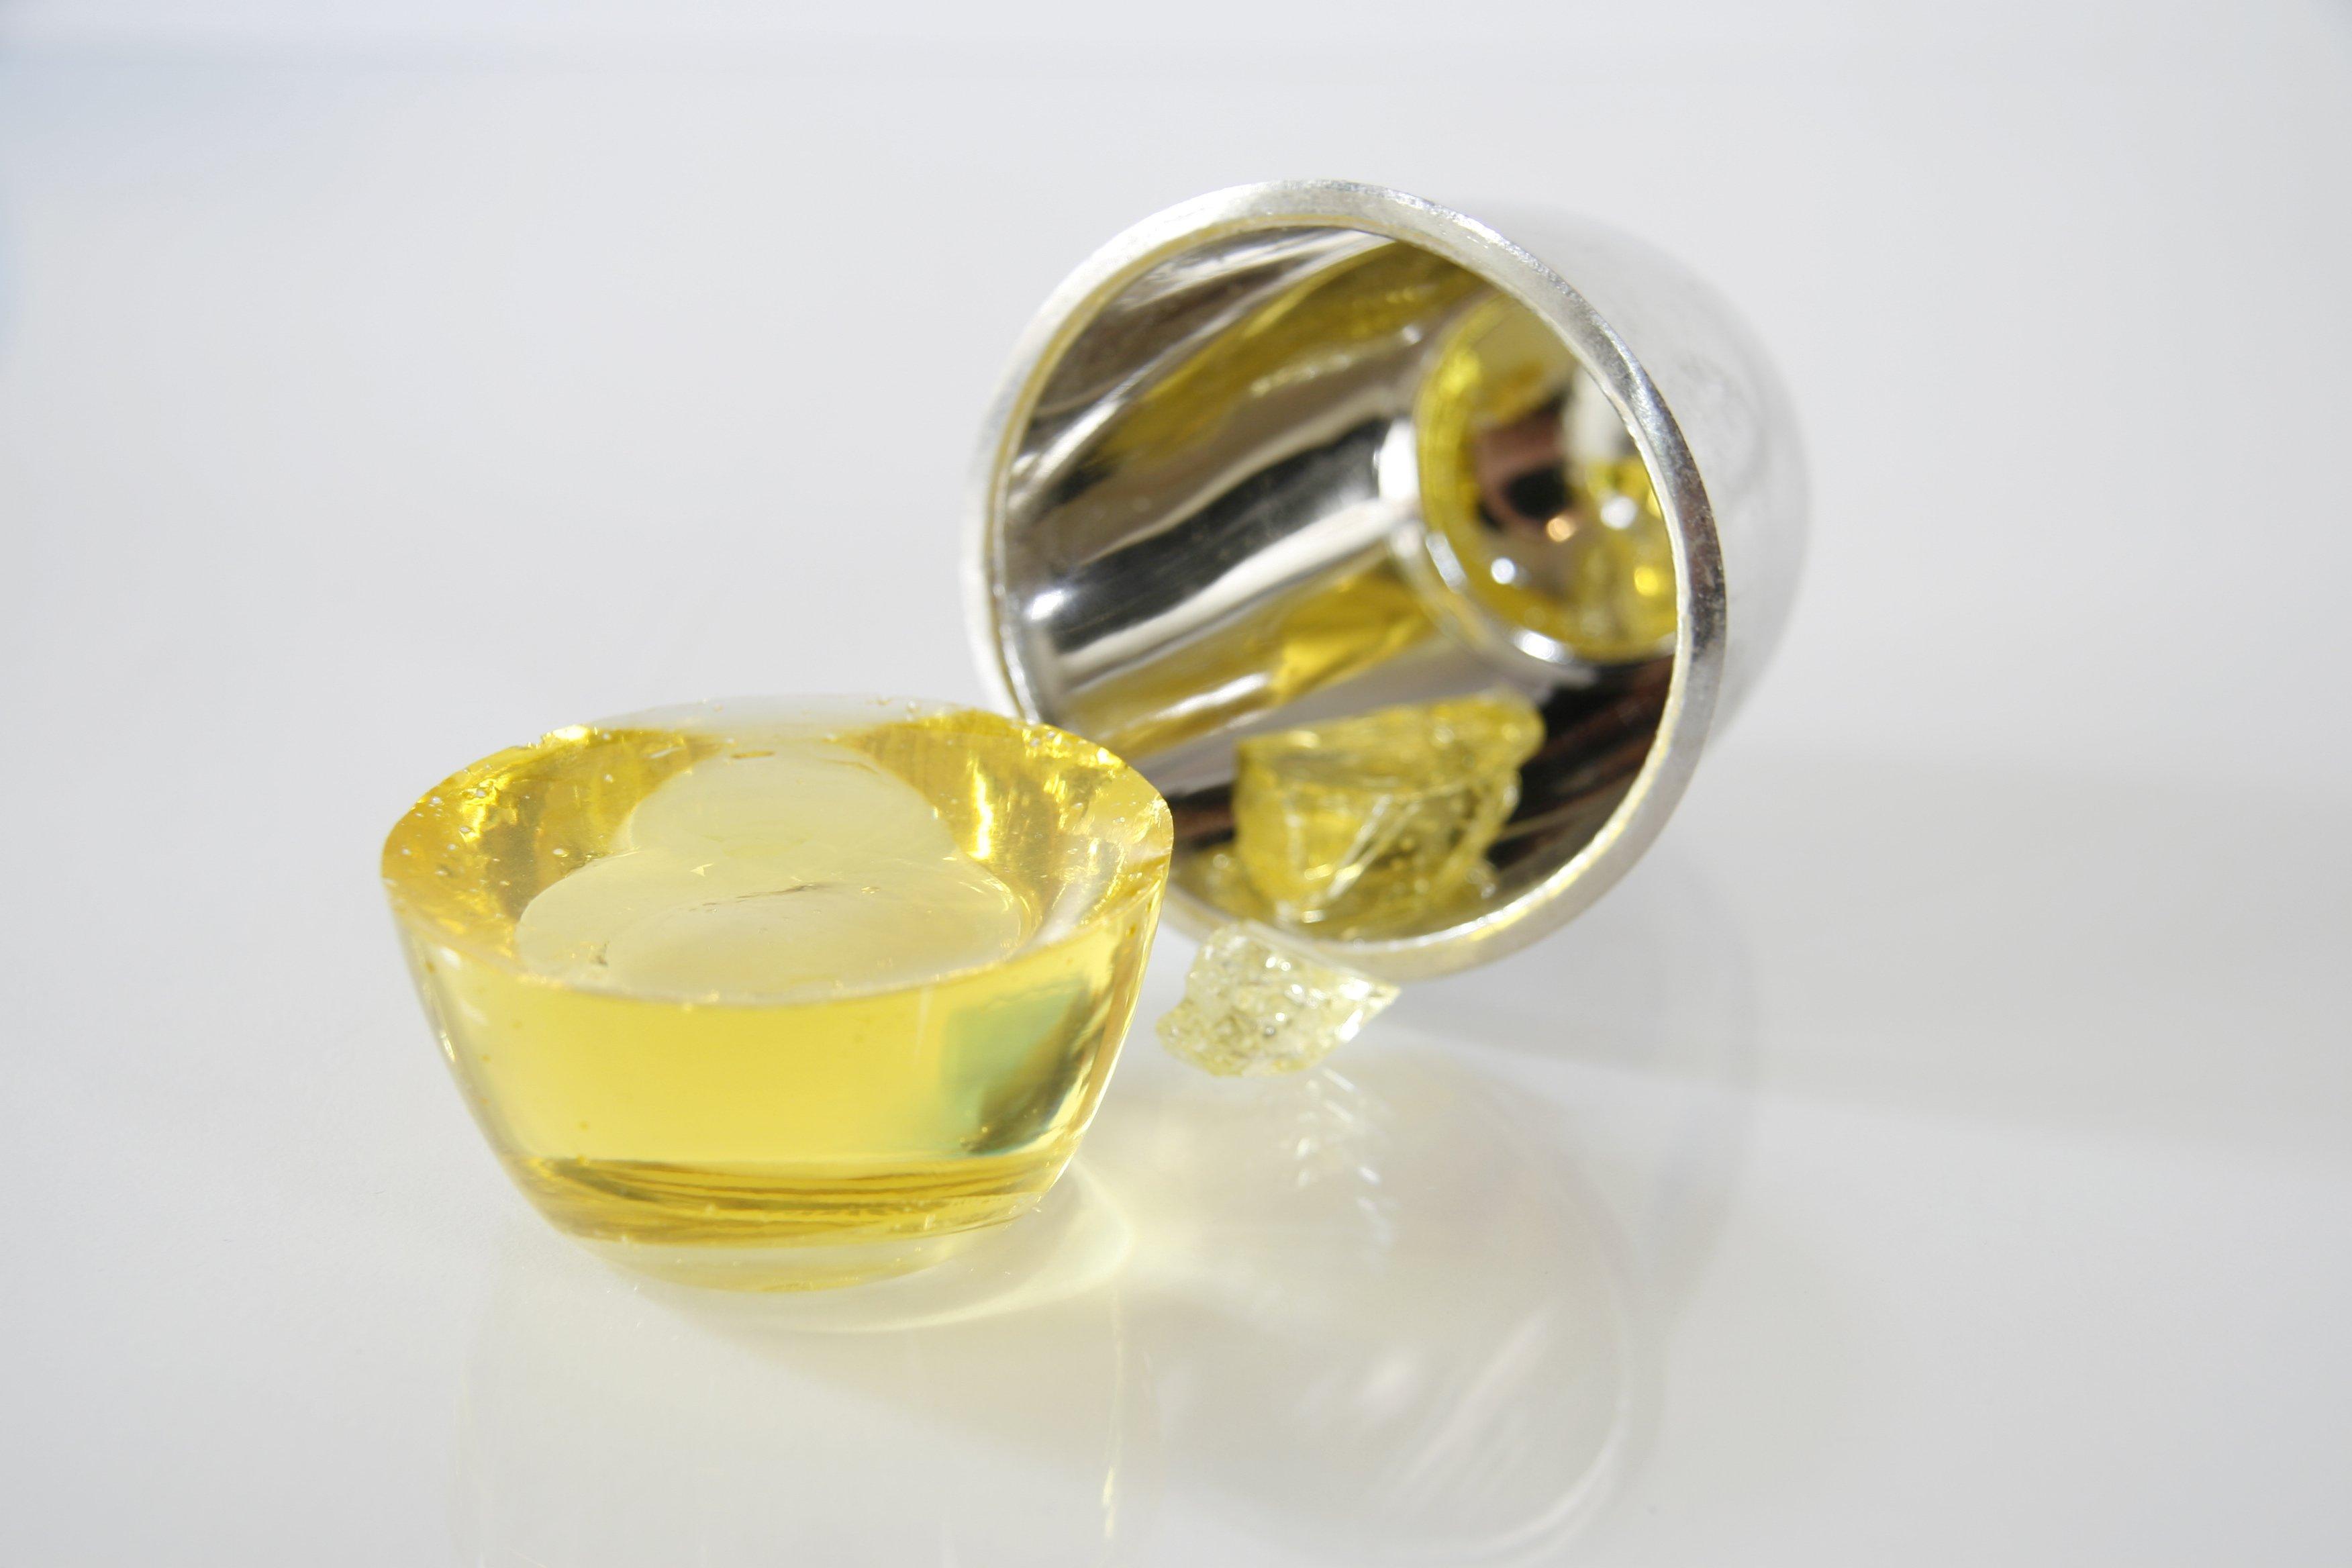 Sensorenprospekt - Glas